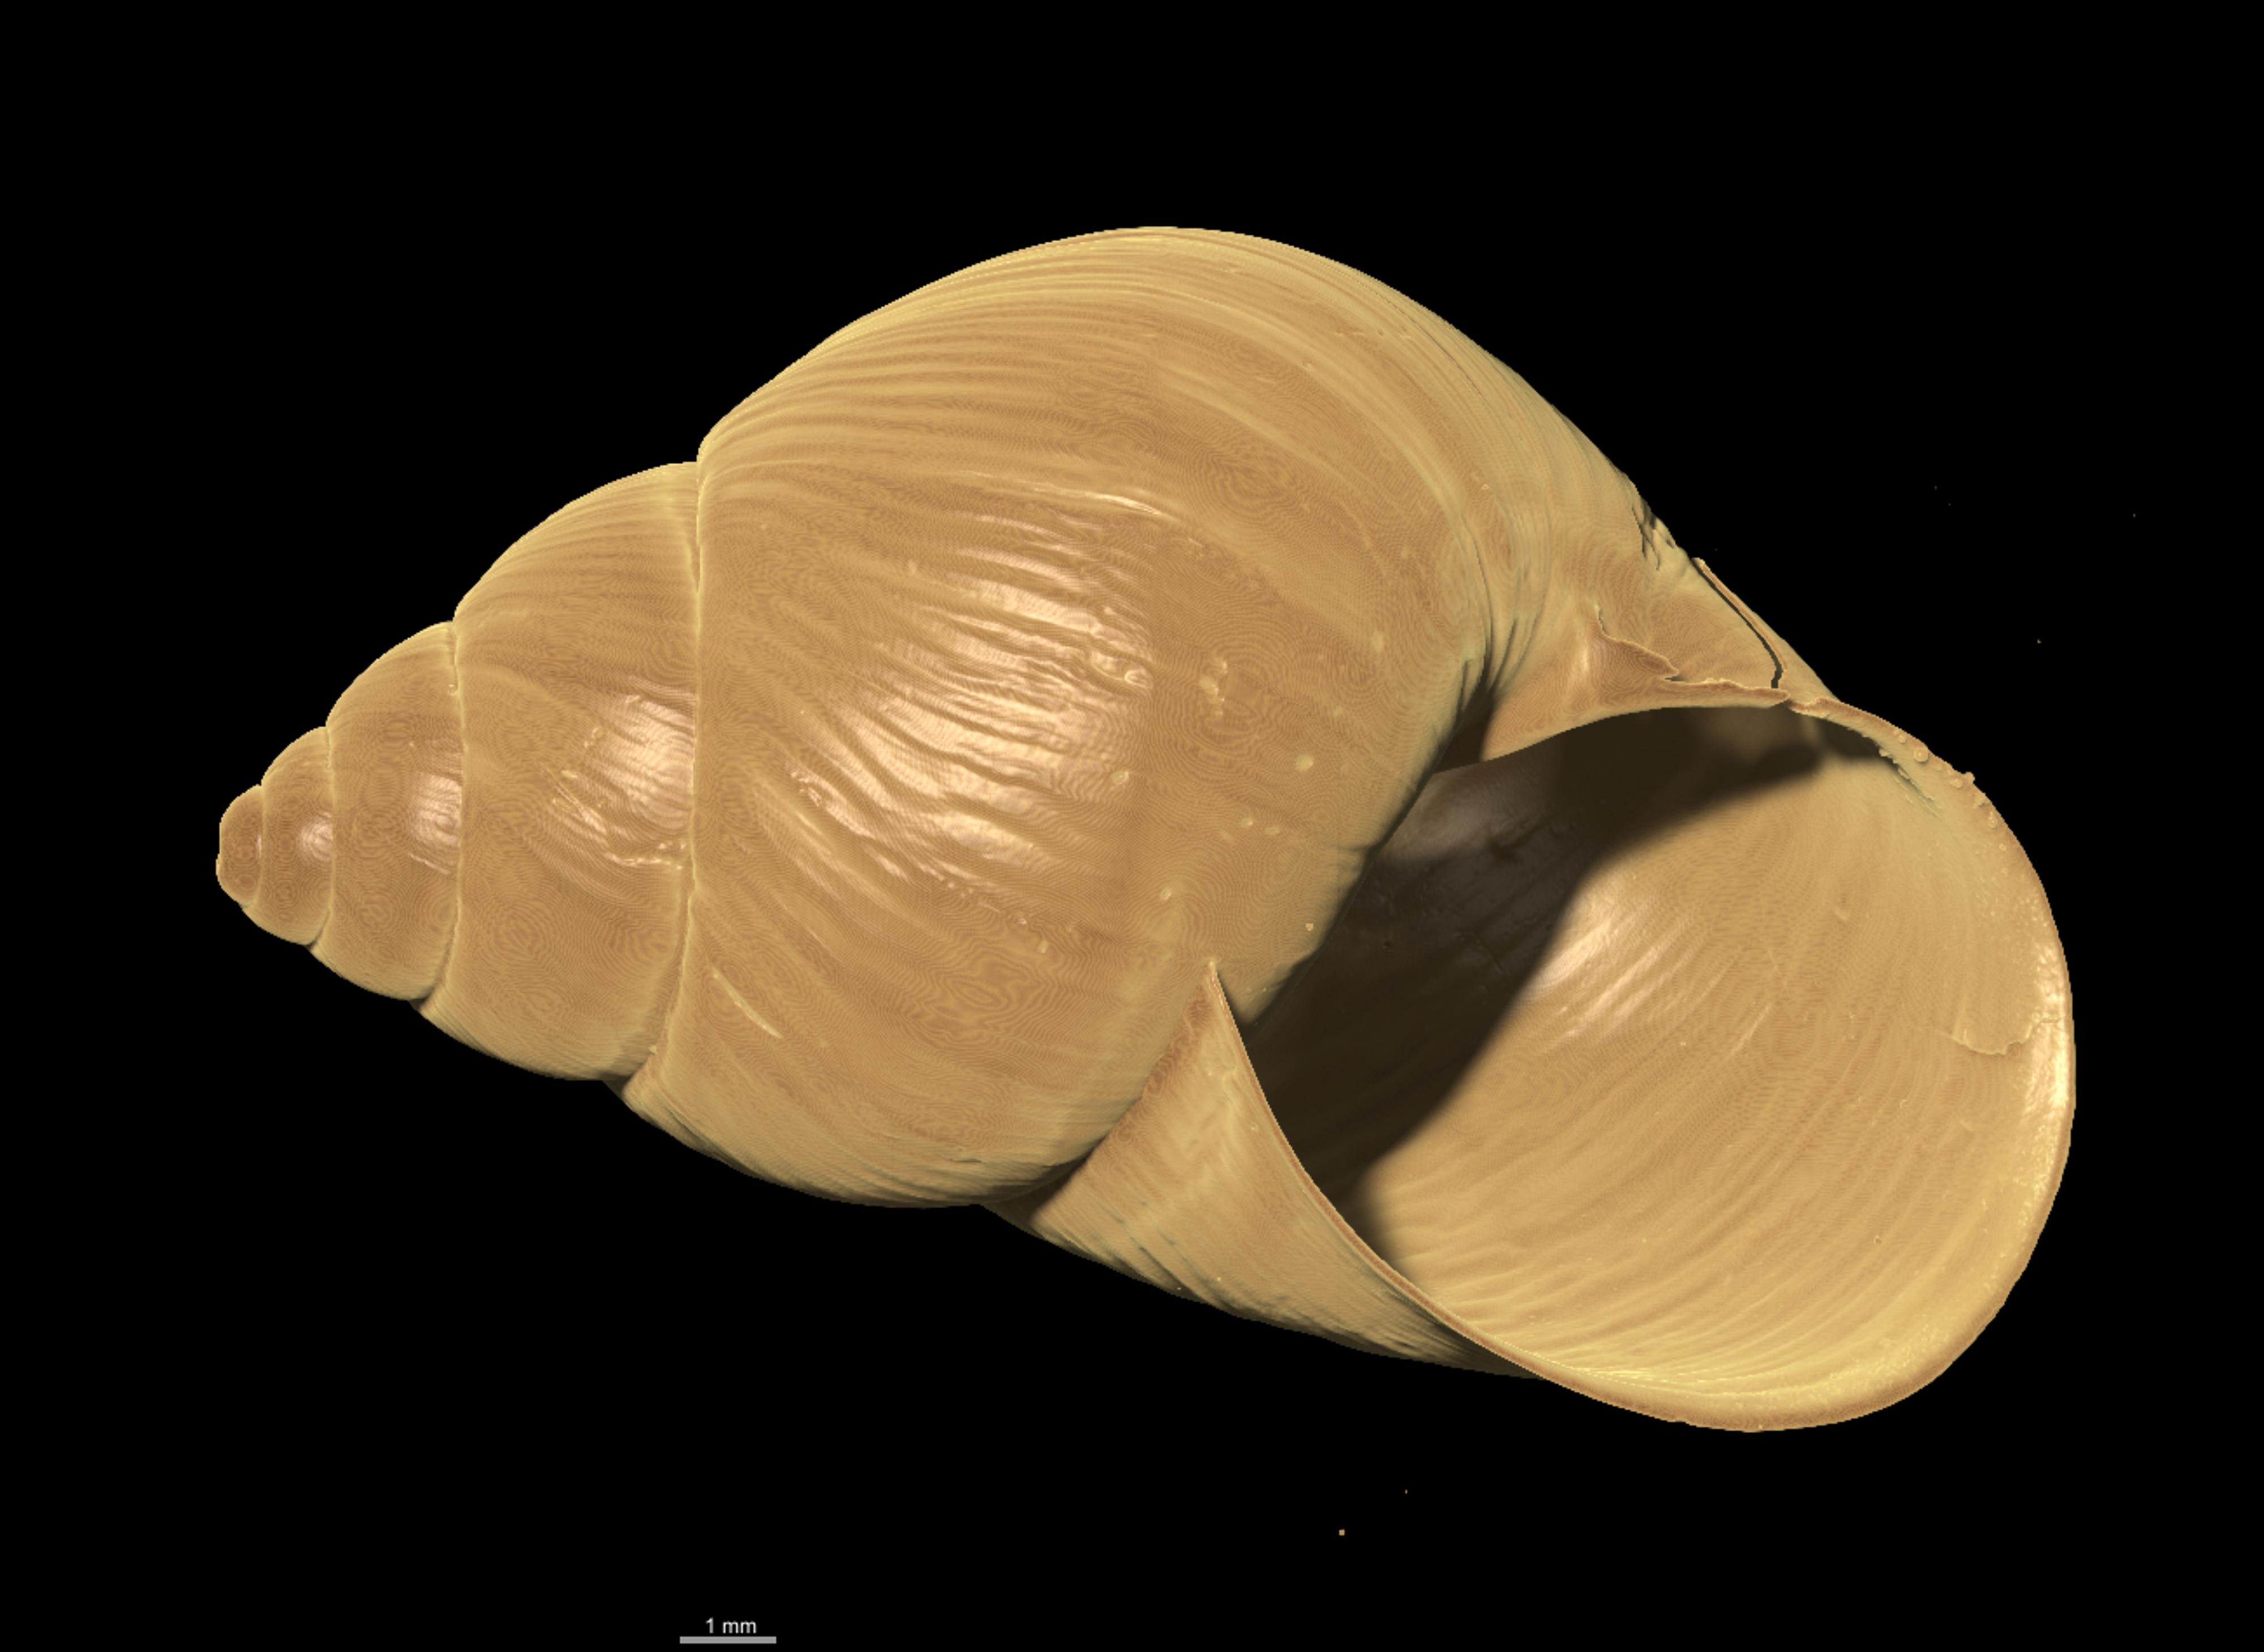 BE-RBINS-INV-TYPES-MT-2350-Simpulopsis-ephippium-ORAL-MICROCT-XRE.jpg